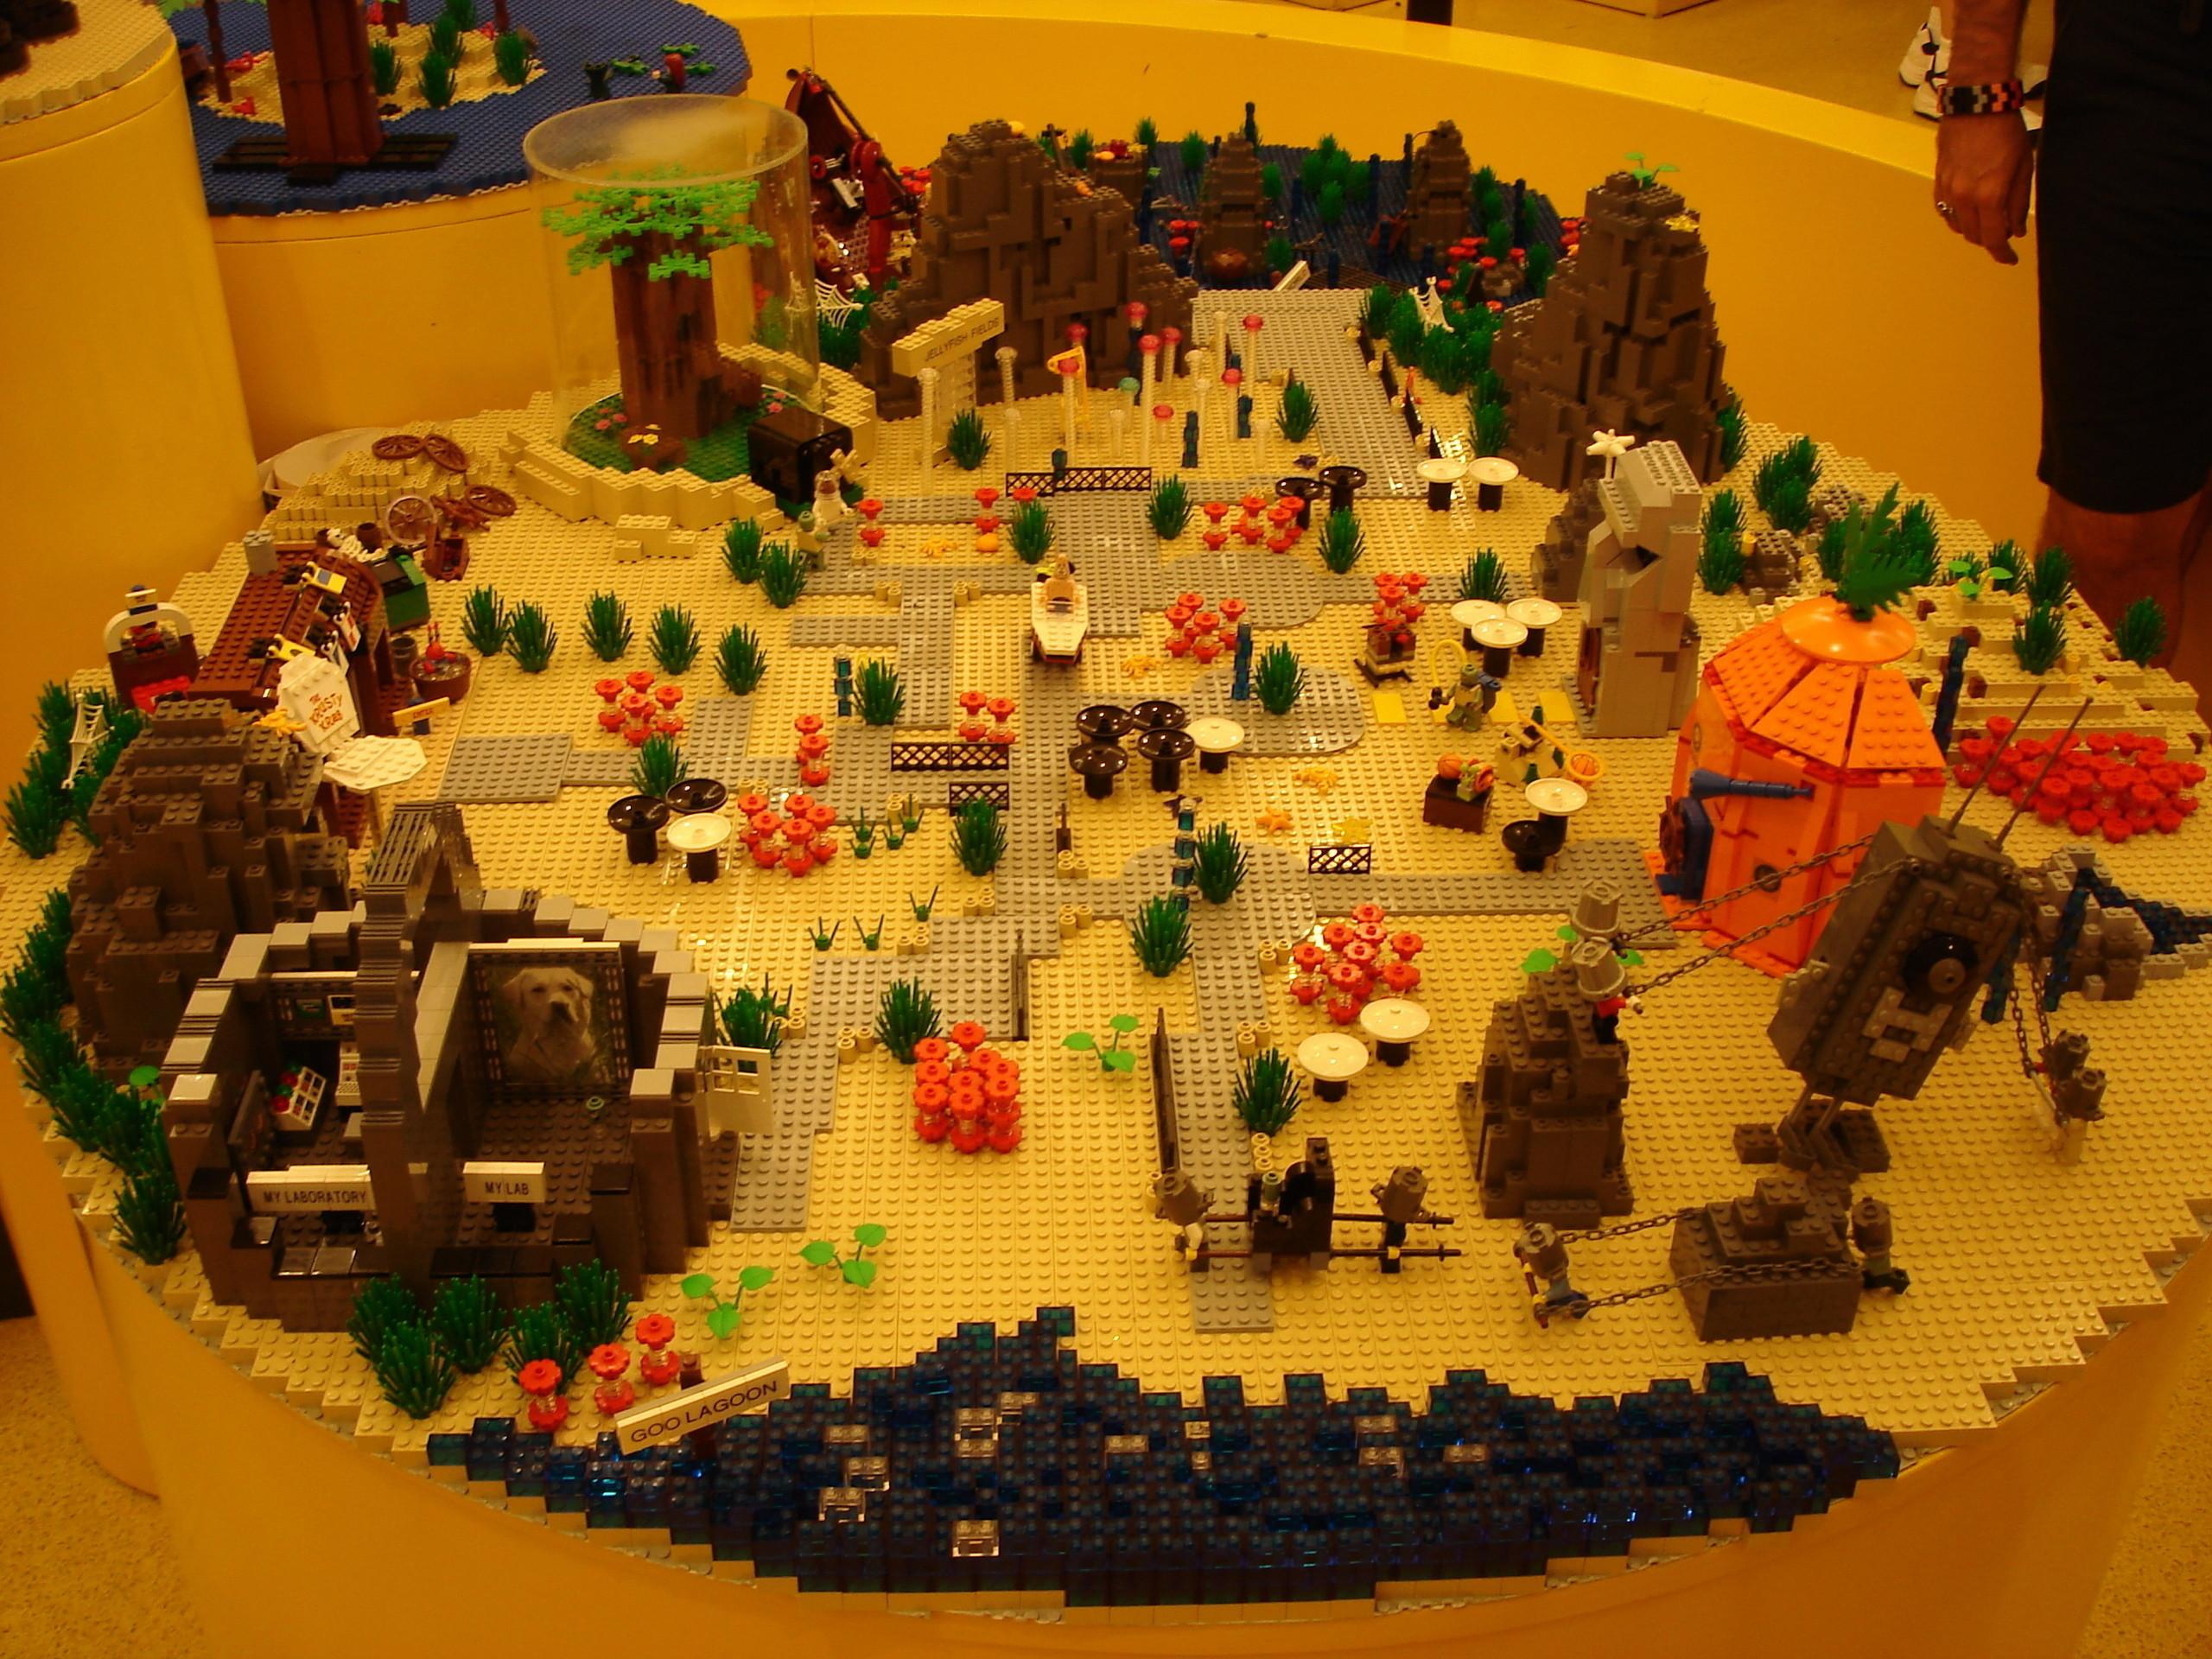 Lego SpongeBob Squarepants images The Hall Of Bikini Bottom HD wallpaper  and background photos